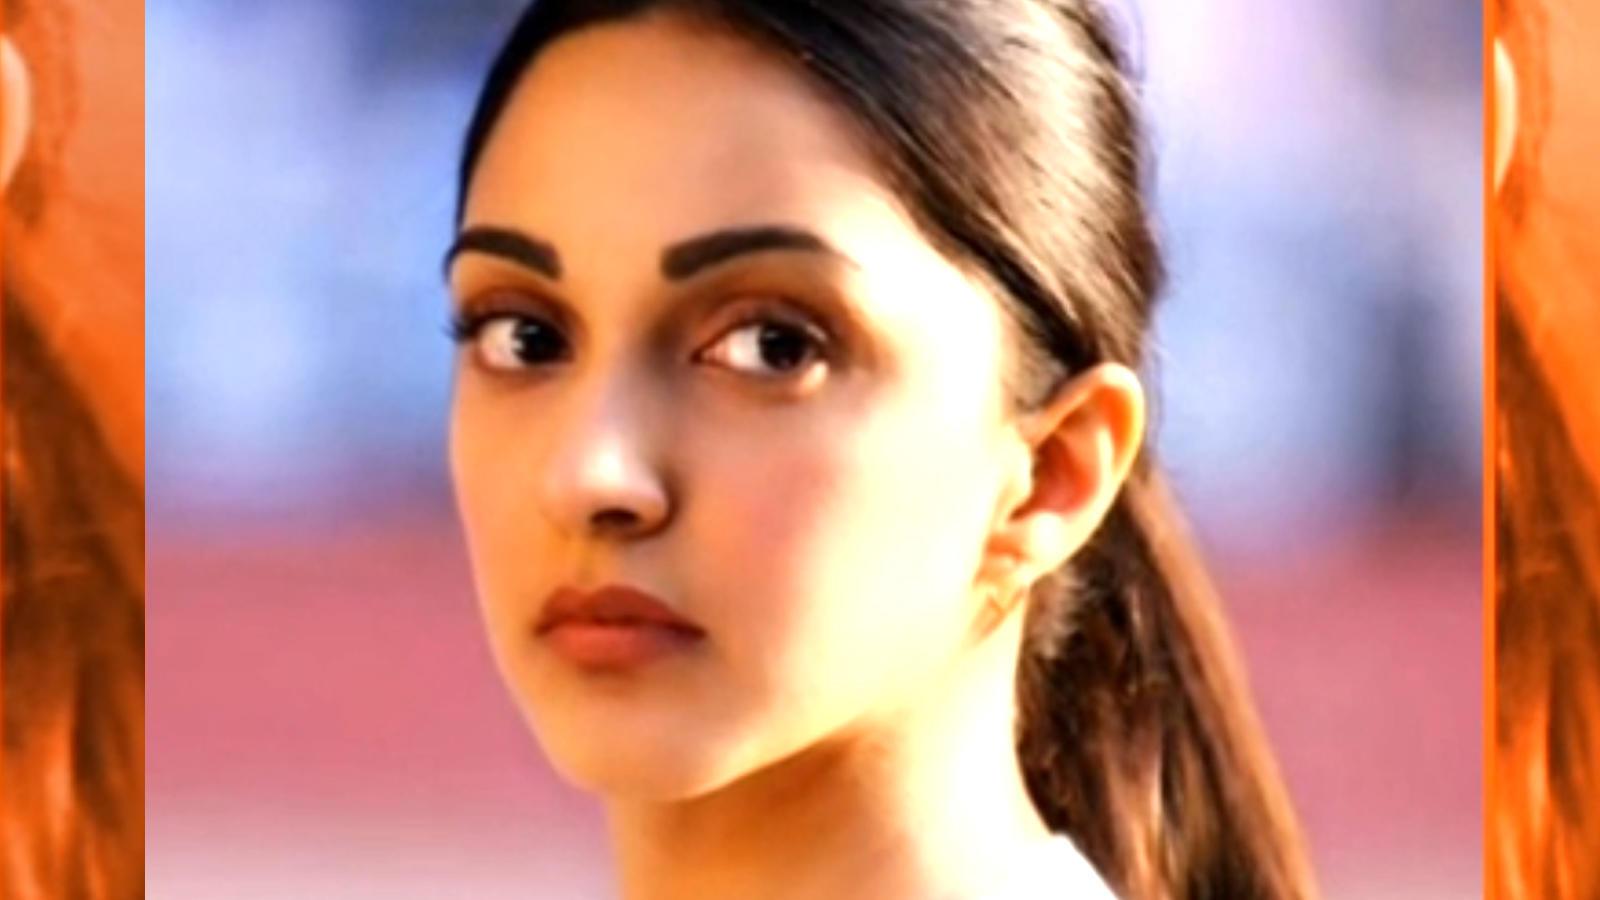 kiara-advani-sporting-a-de-glam-look-for-the-arjun-reddy-remake